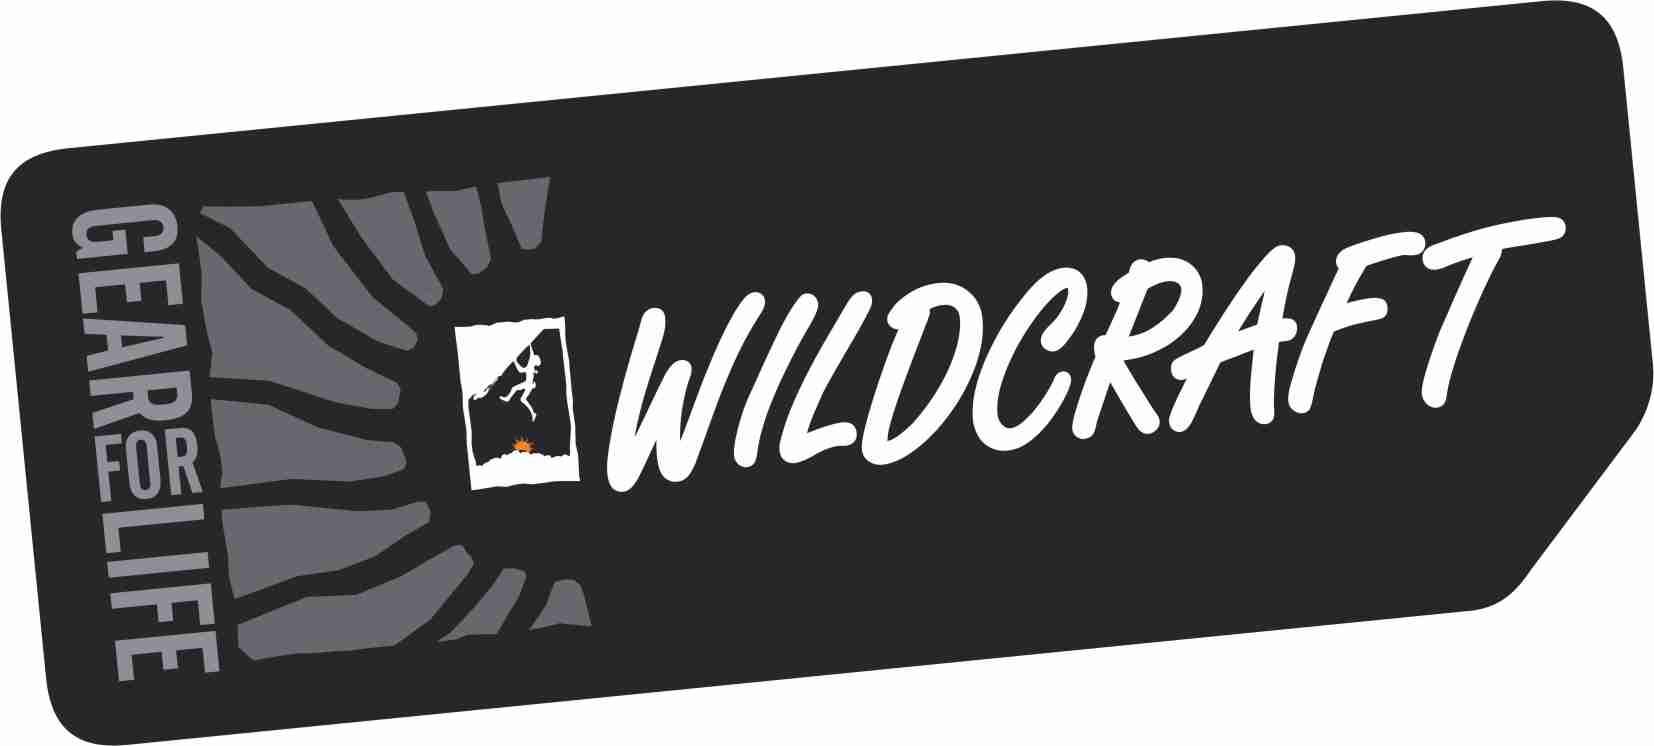 File:Wildcraft.jpg.